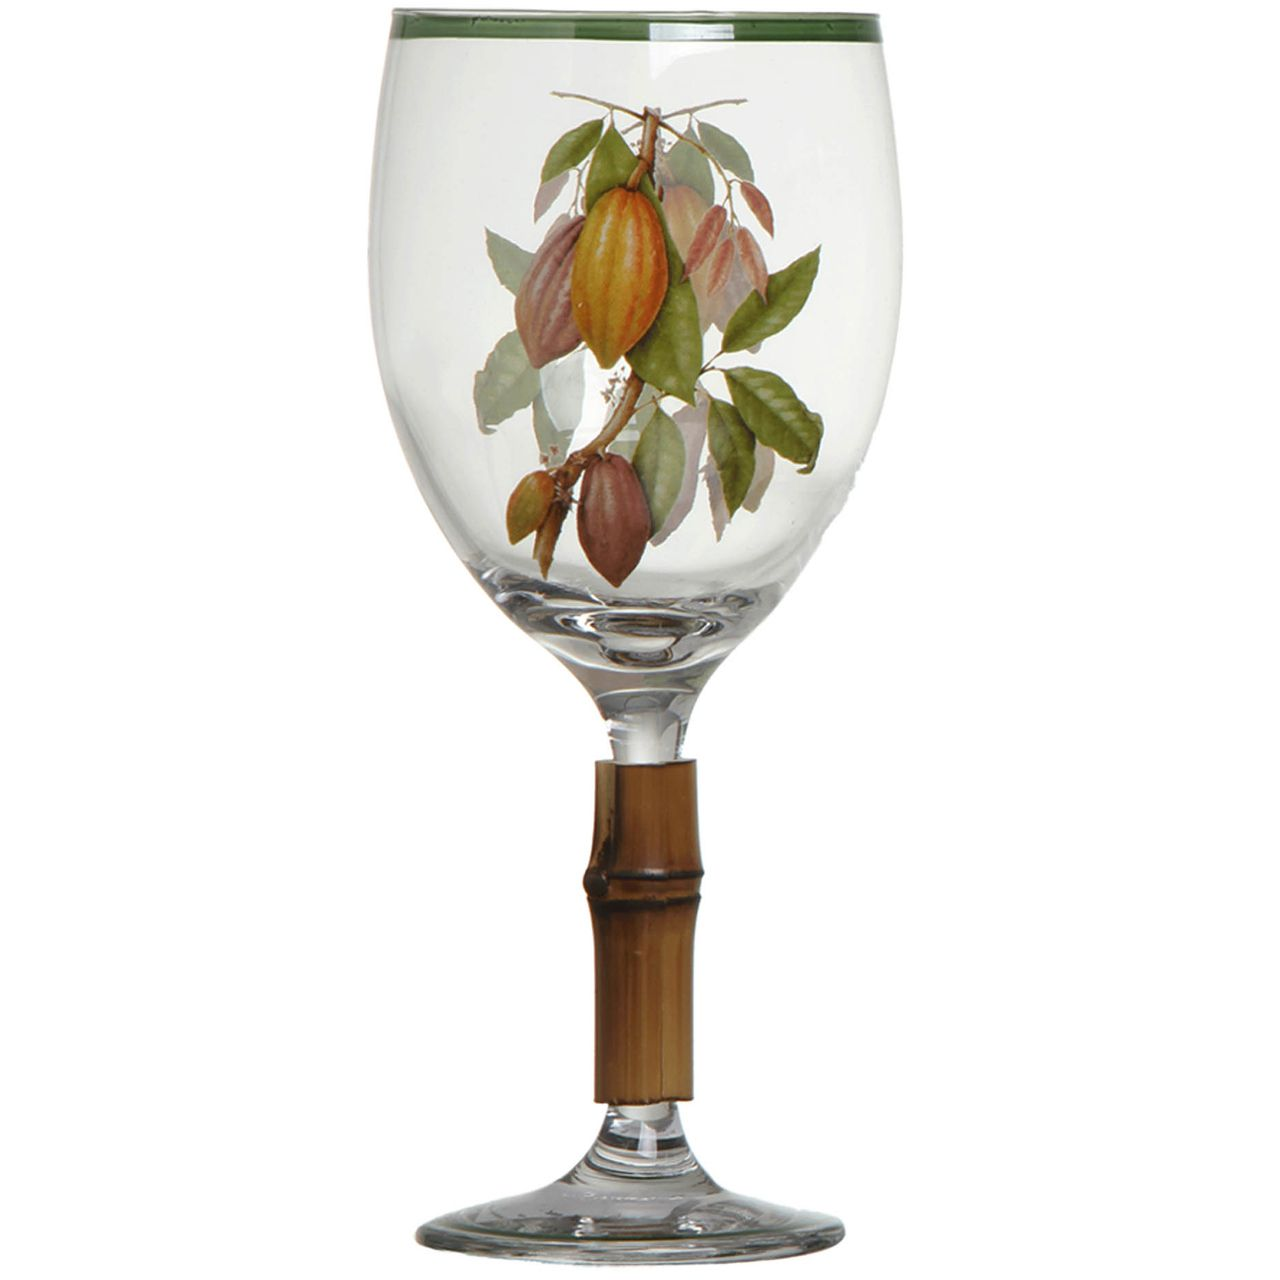 Taça de Água c/ Bambu Nostri Frutti Cacau (06 Unidades) Cód.: 3851 - MB